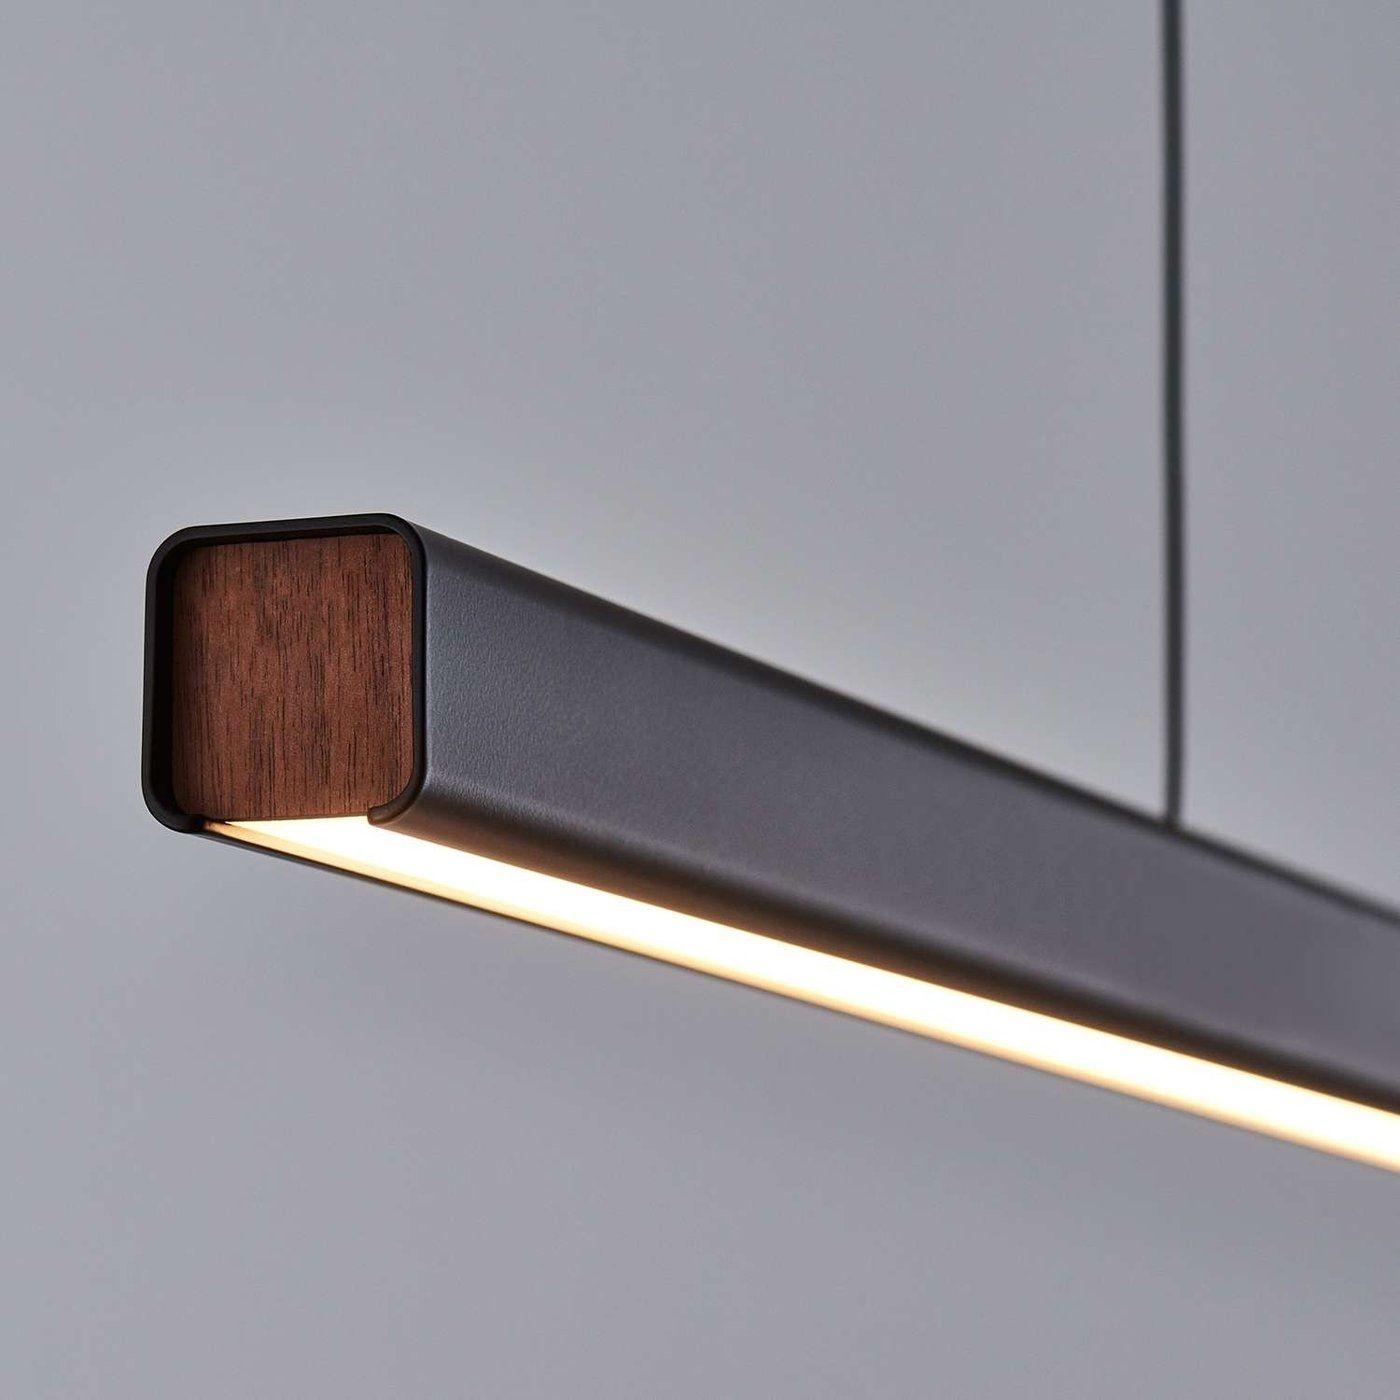 linear suspended lighting. Linear Suspended Lighting R